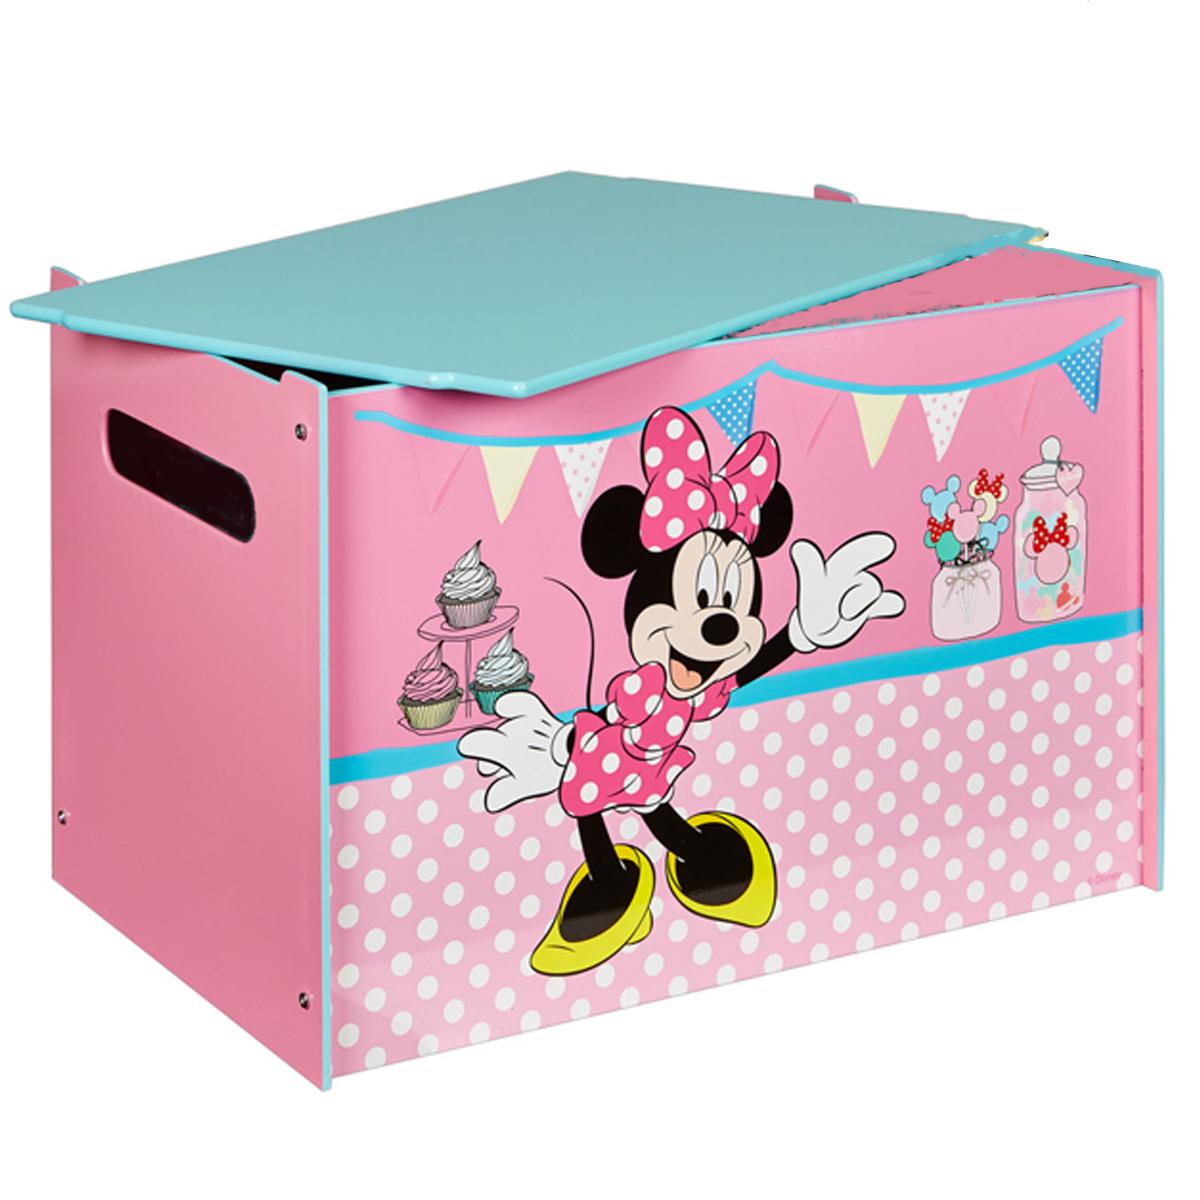 Disney Minnie Mouse Toy Box Mdf Holz Deckel Spielzeugkiste